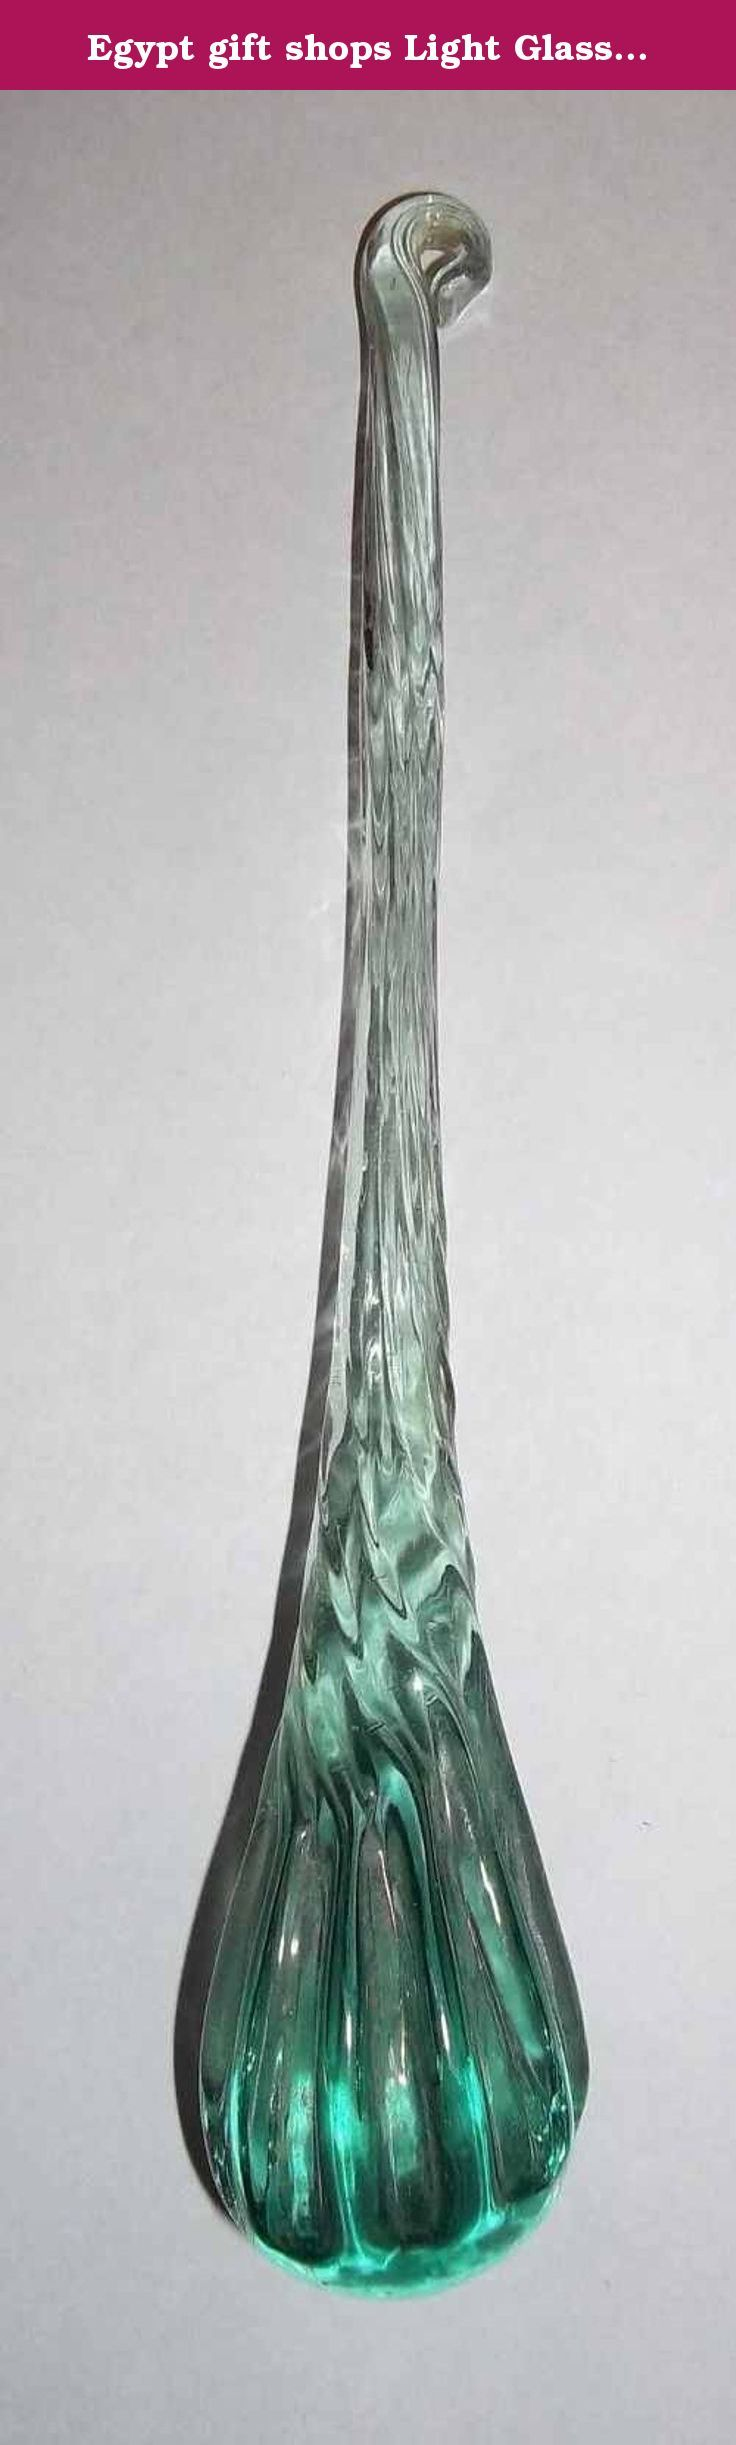 "Egypt gift shops Light Glass Crystal Beads Chandelier Rain Drop Eye Tear Lamp Work Lampwork. Dimensions: 6"" X 1"" X 1""."